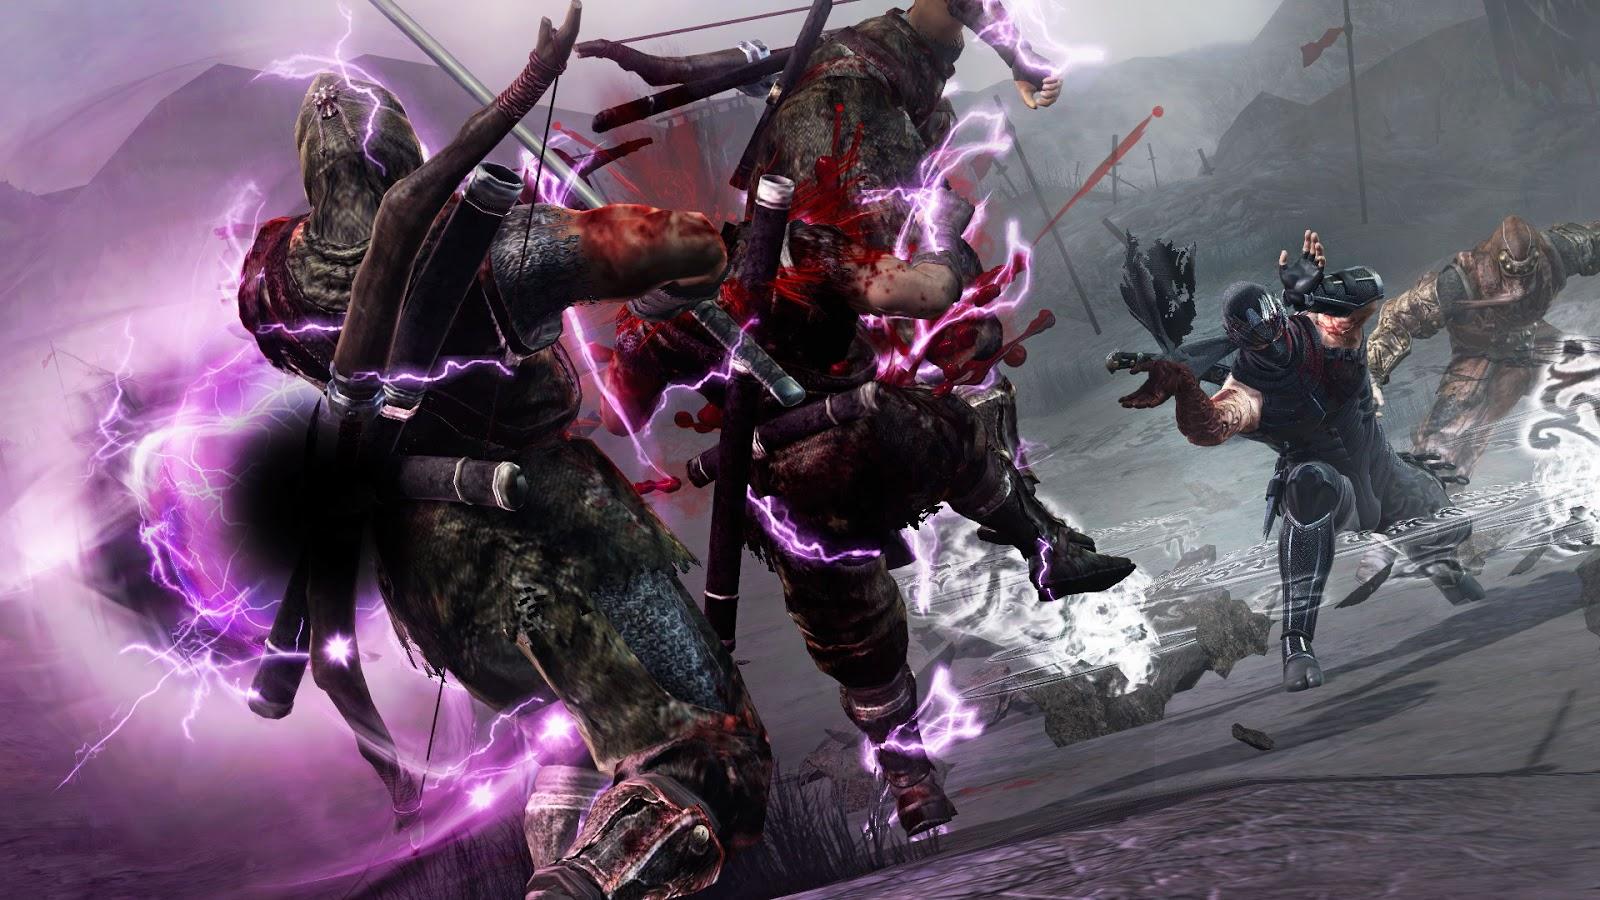 Ninja Gaiden 3 Razors Edge Goes Multiplatform We Know Gamers Gaming News Previews And Reviews